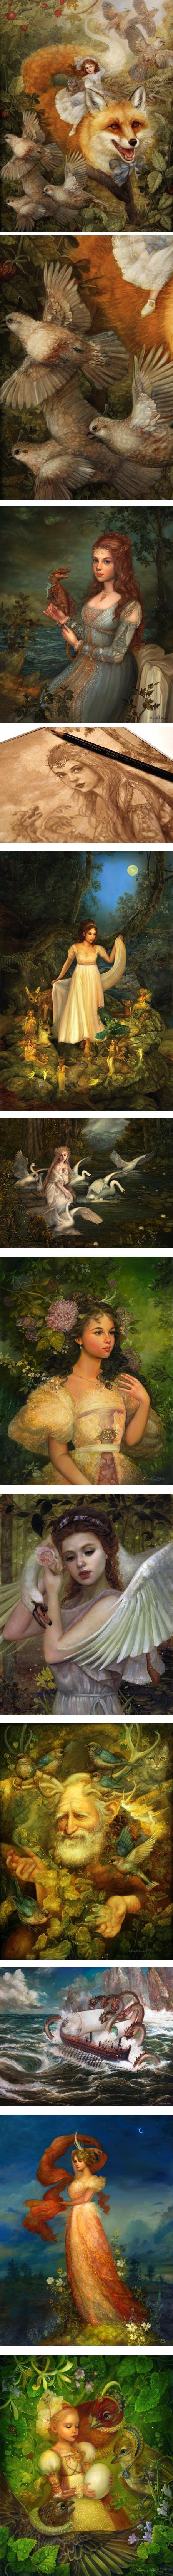 Annie Stegg, fantasy art and illustration